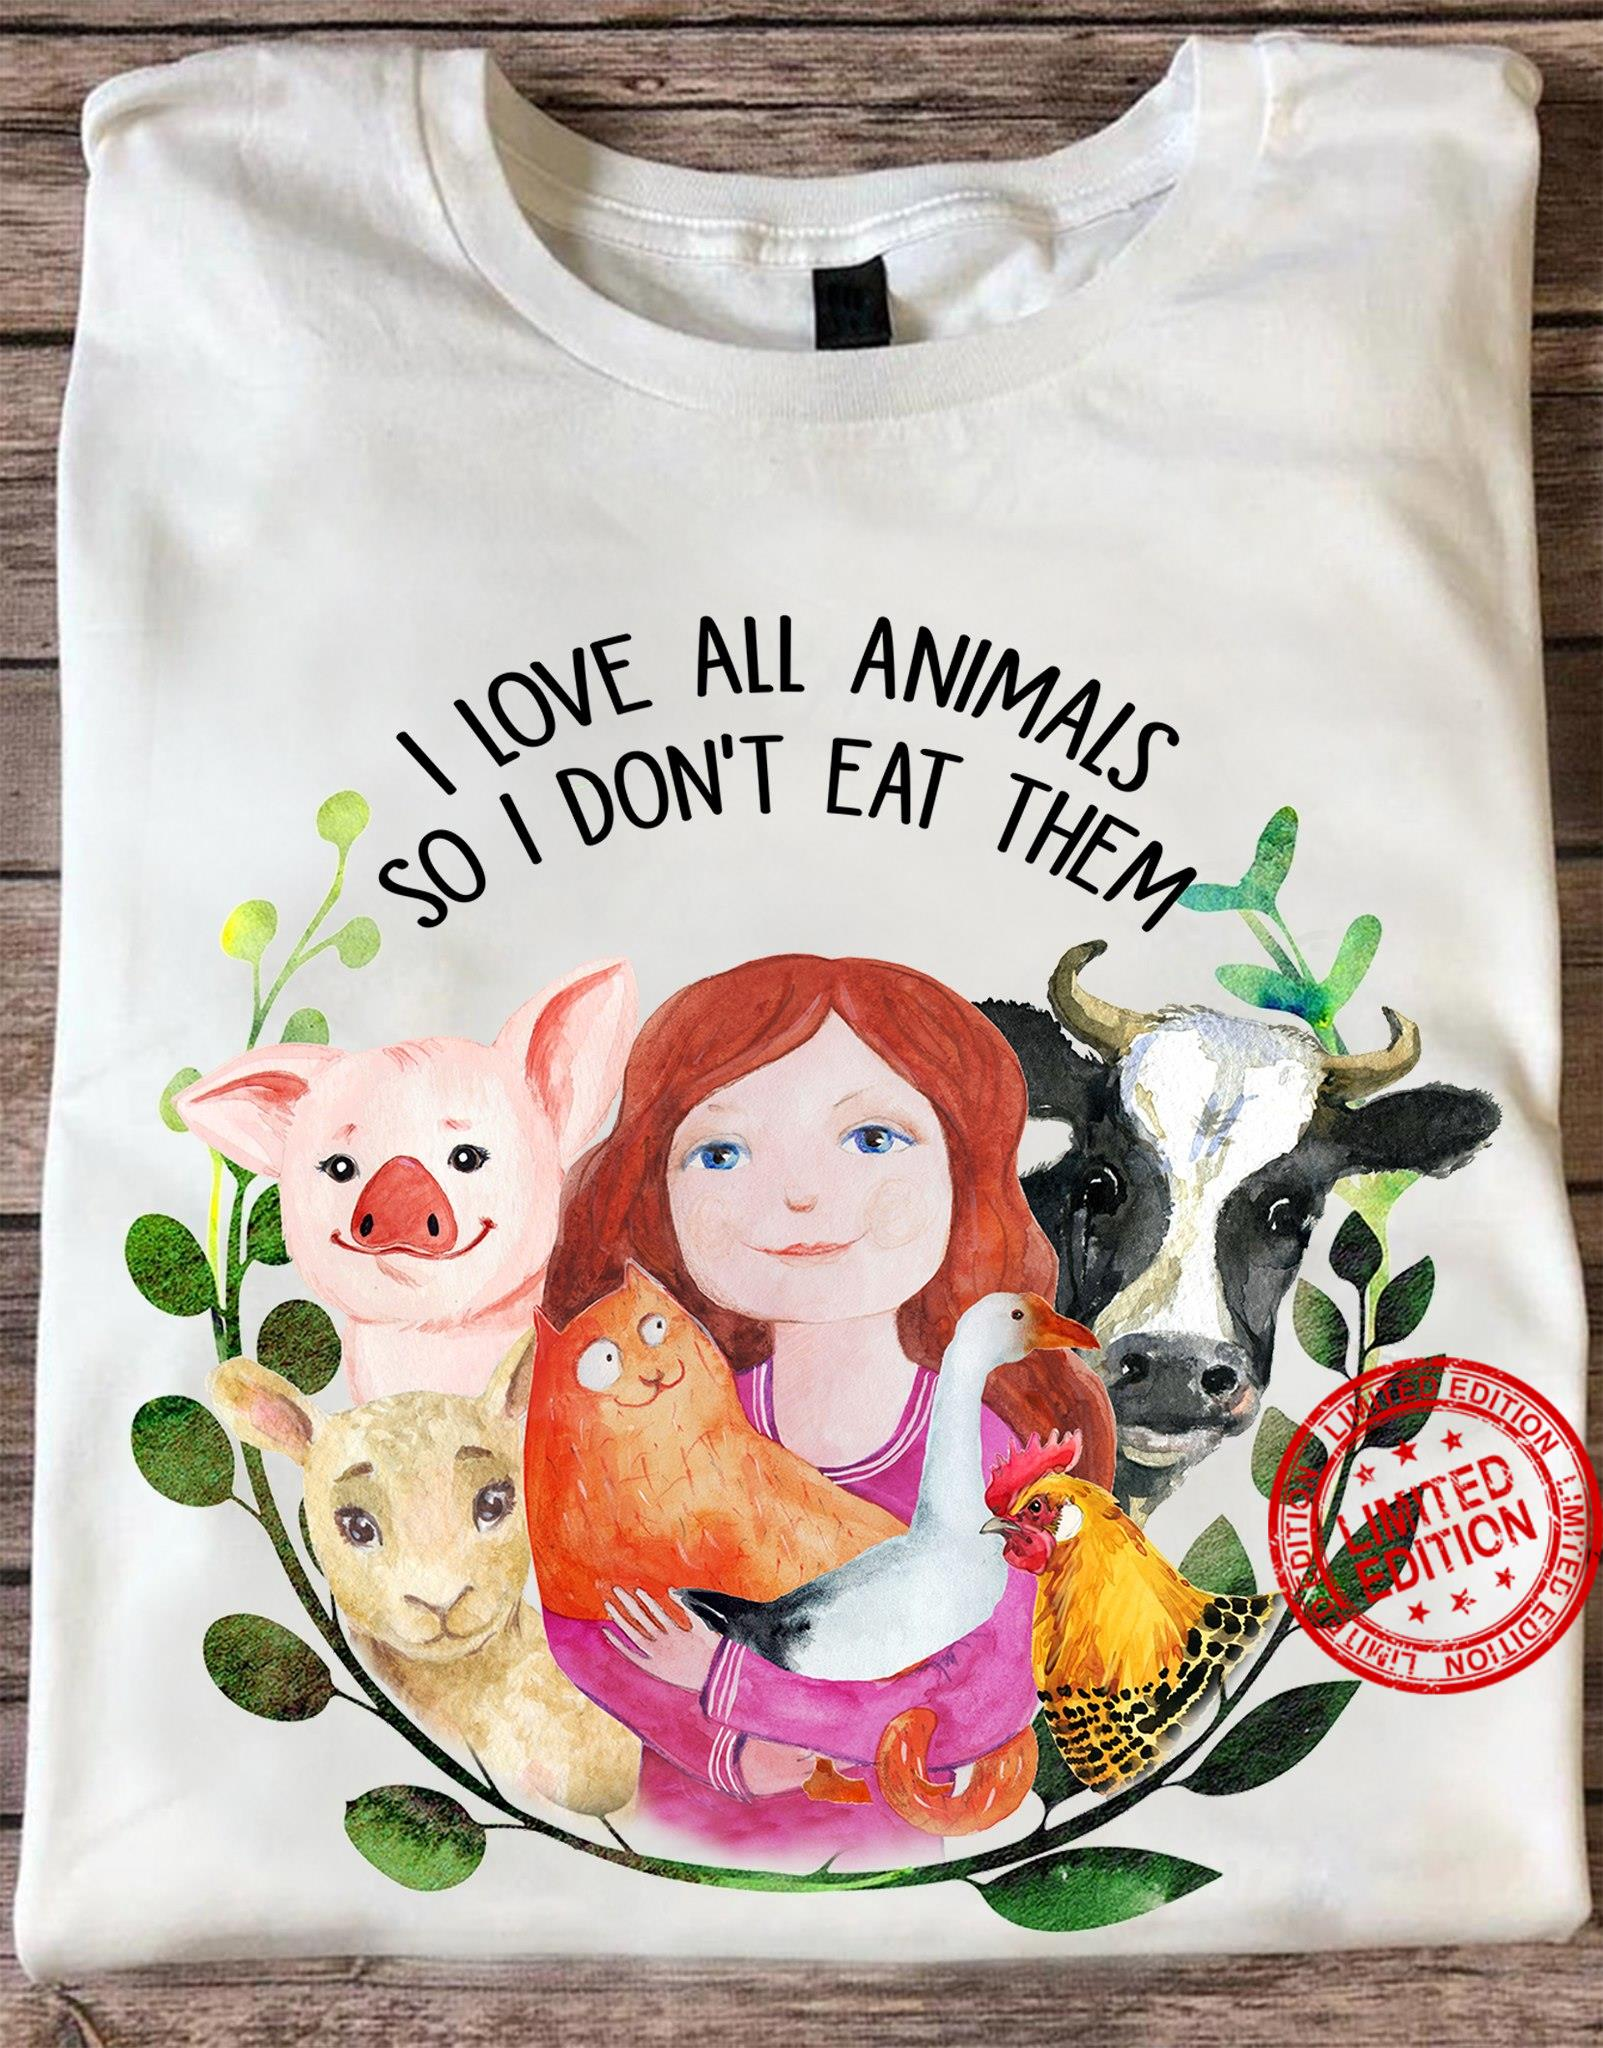 I Love All Animals So I Don't Eat Them Shirt